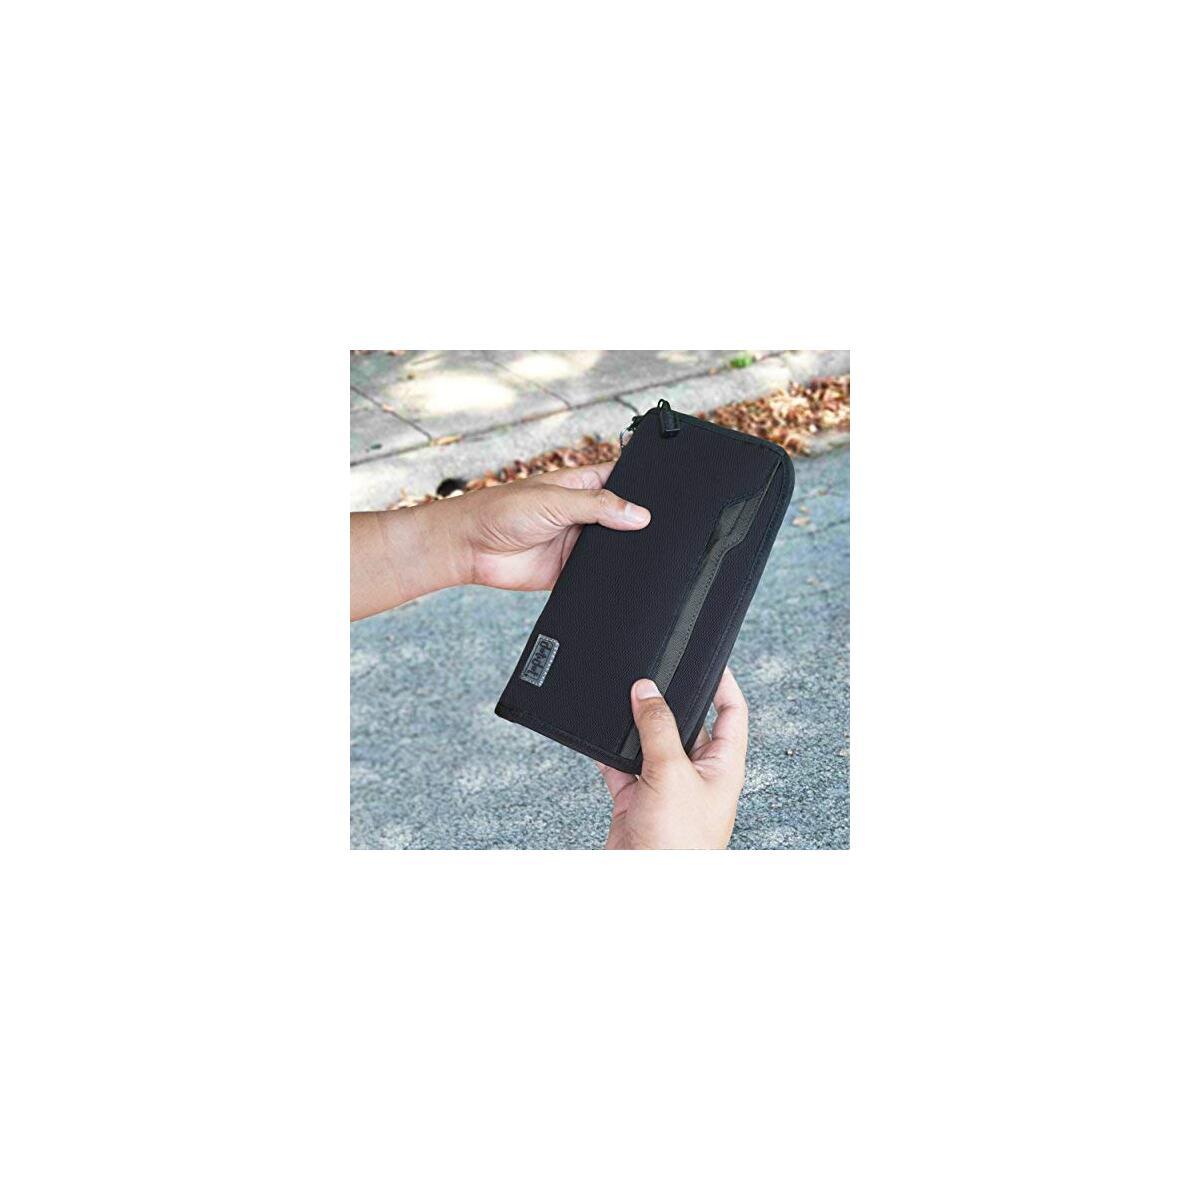 Travel Neck Wallet Passport Holder - Rfid Blocking Boarding Pass, Travel Document Organizer for Men and Women (10 Inch, Black)